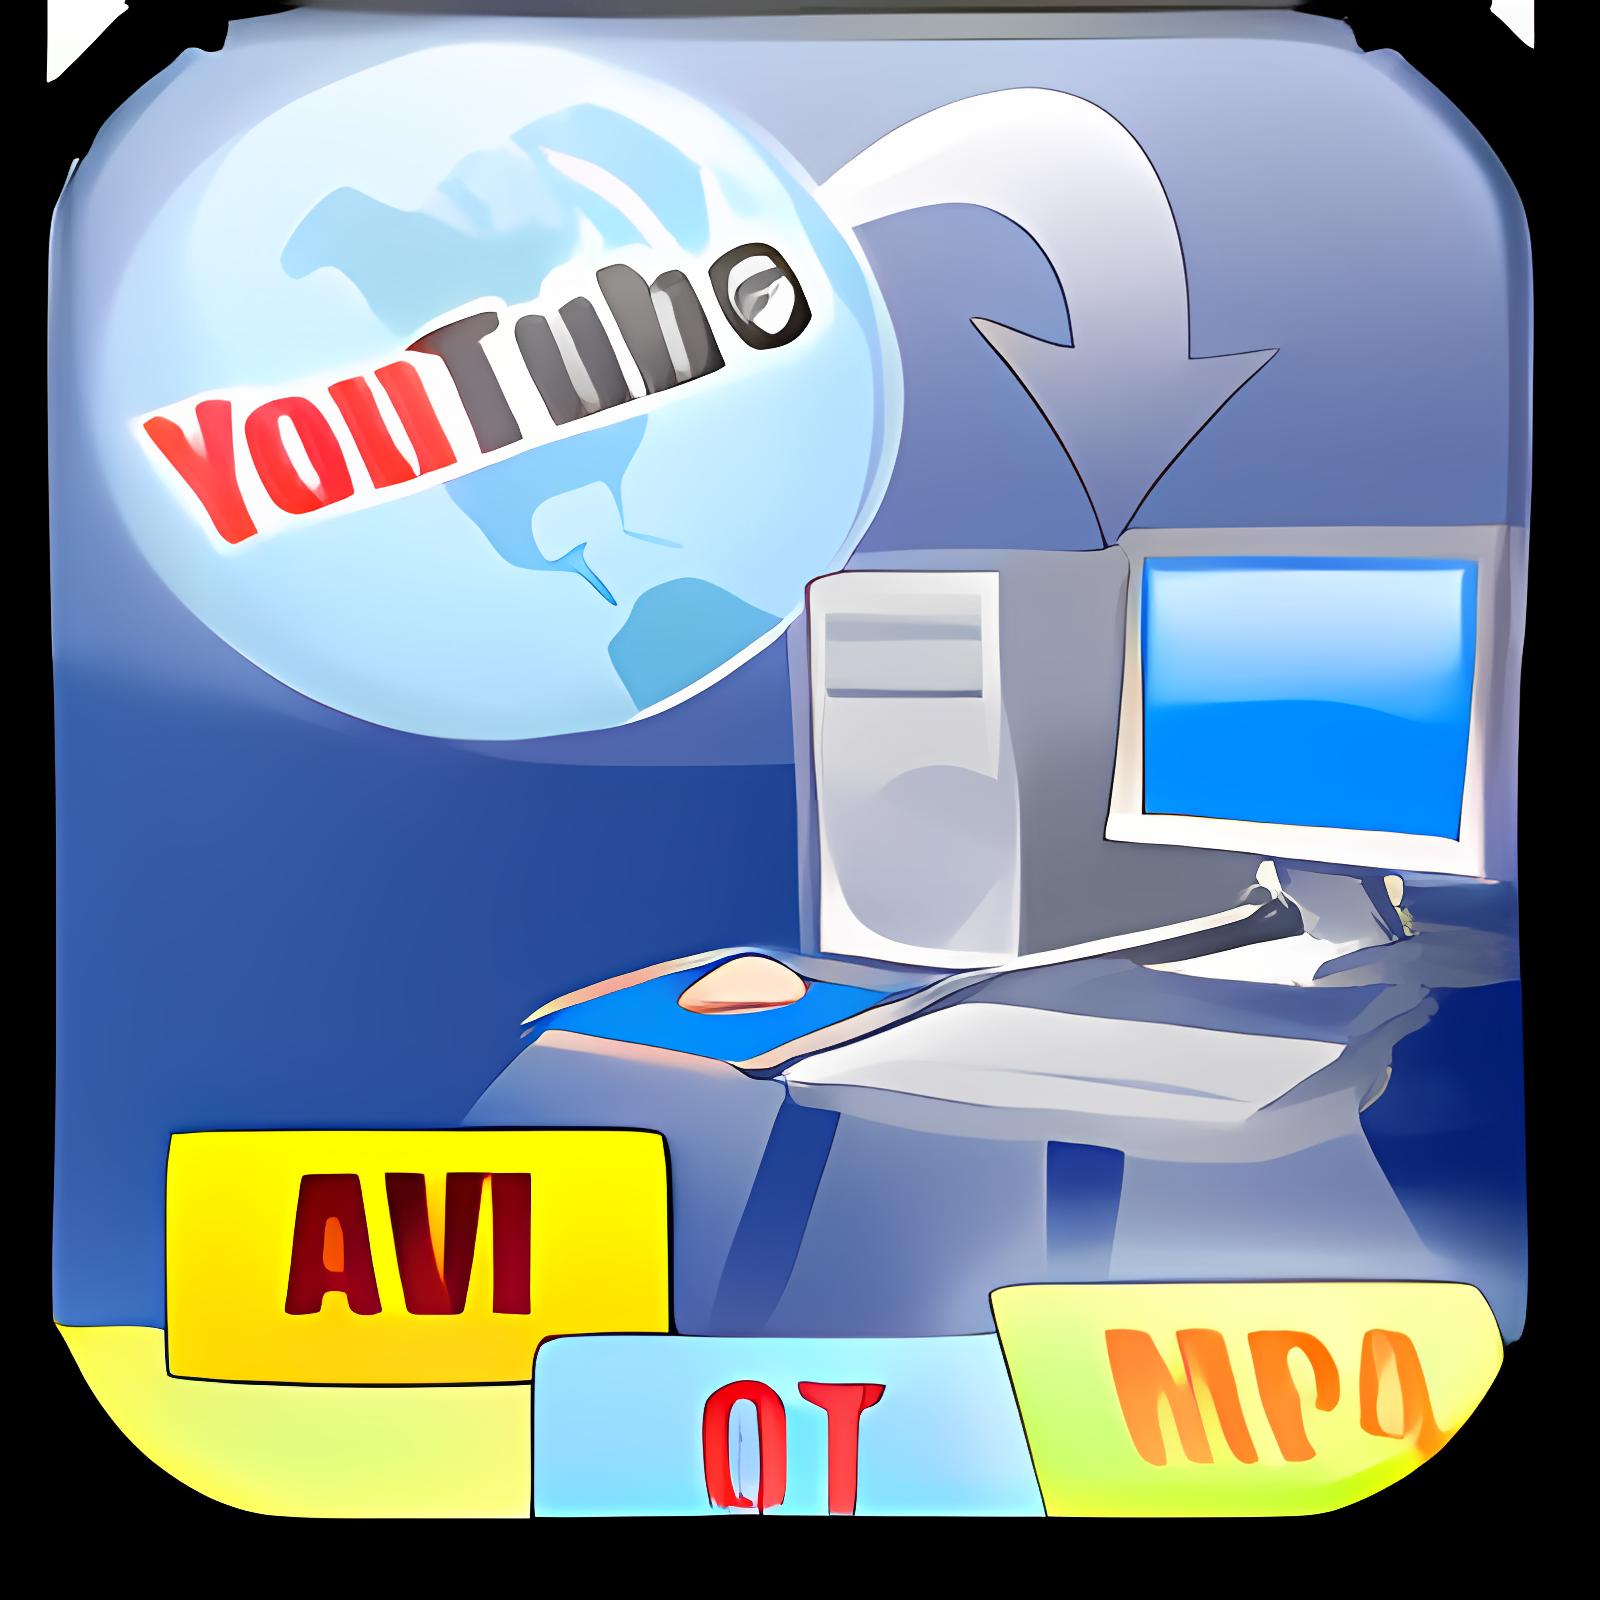 Videovac